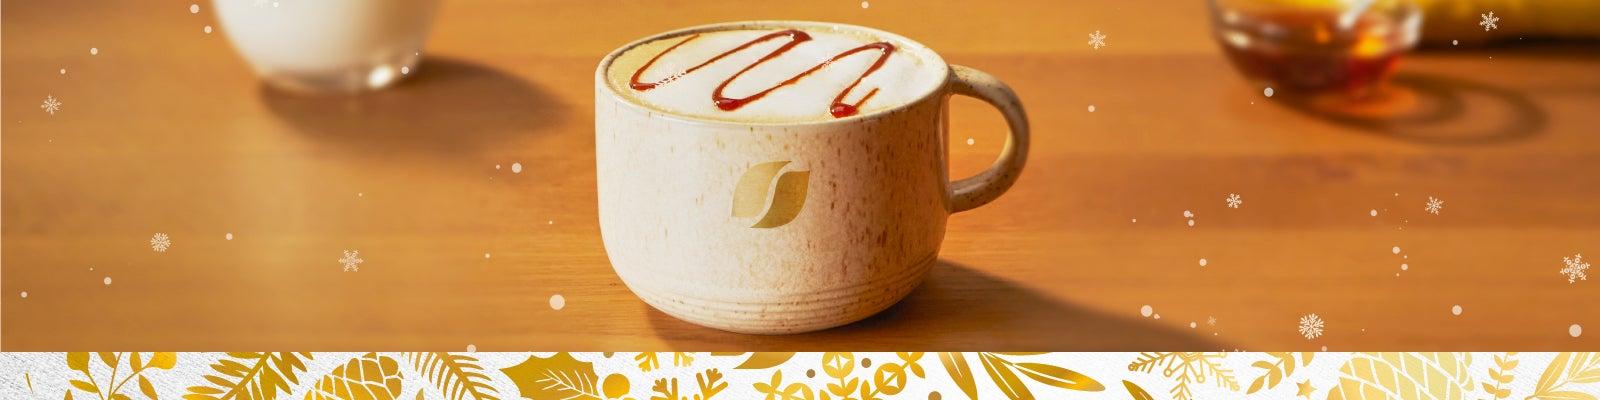 Festive-Caramel-Latte